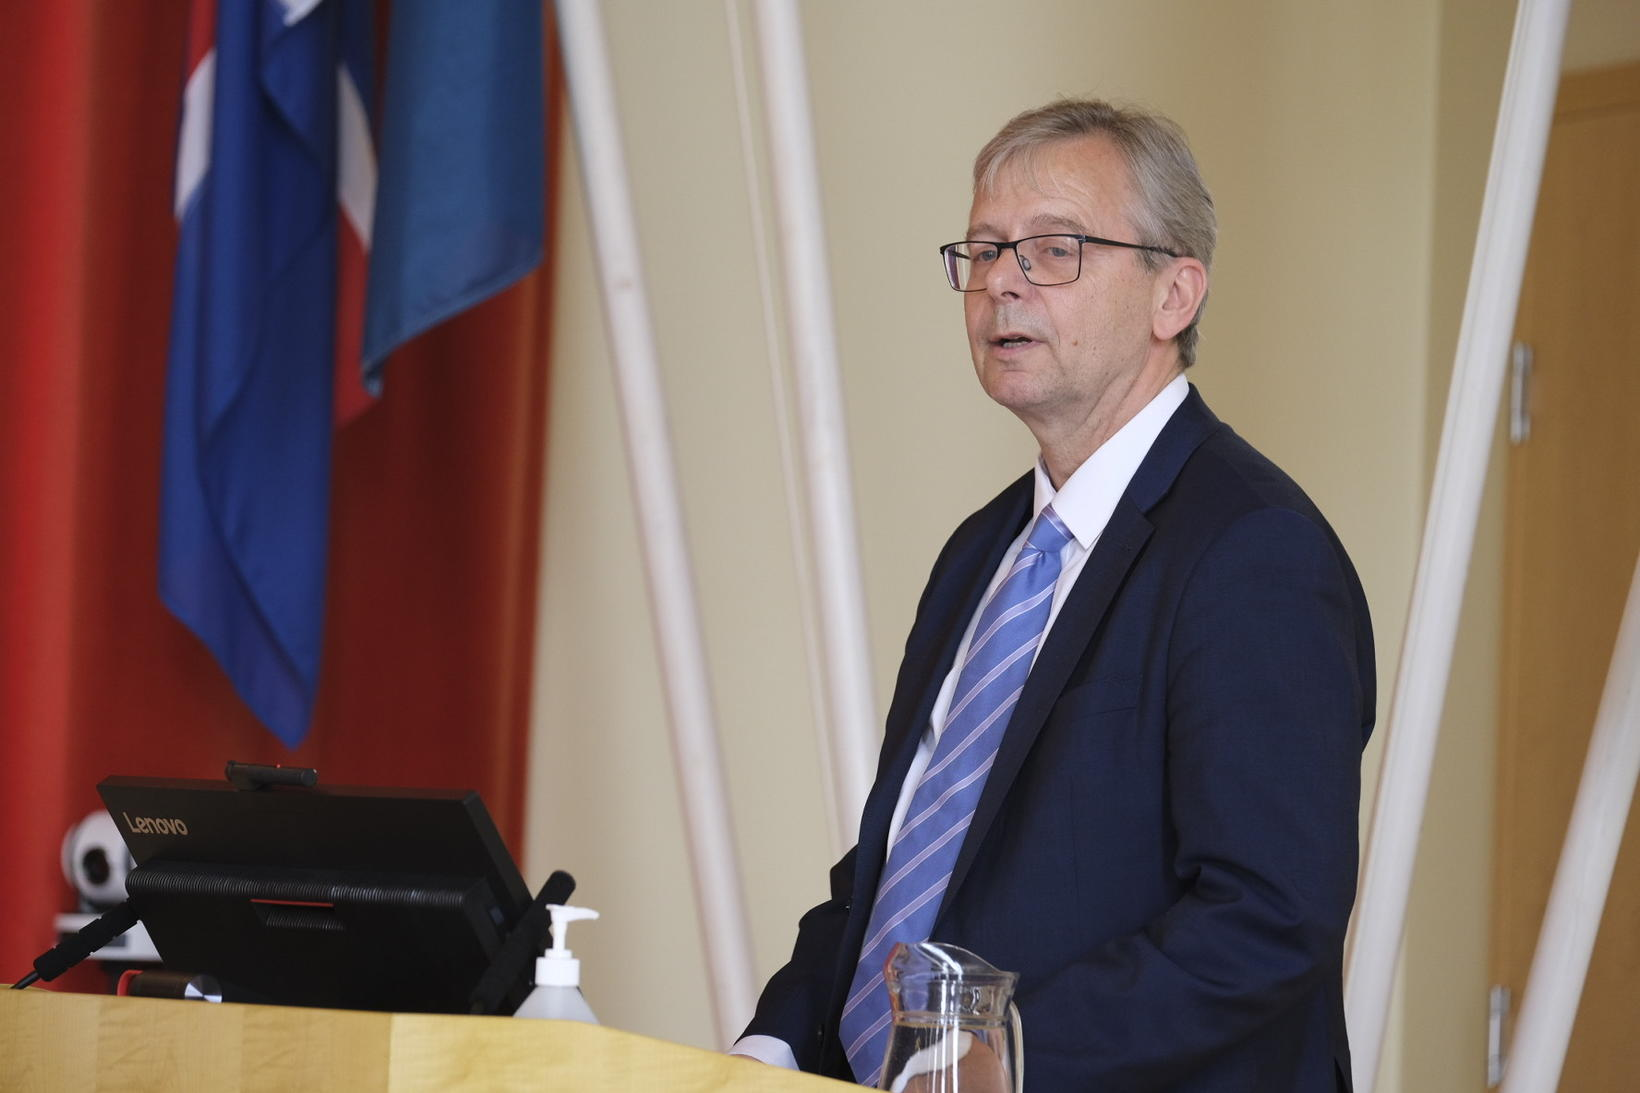 University of Iceland Rector Jón Atli Benediktsson.